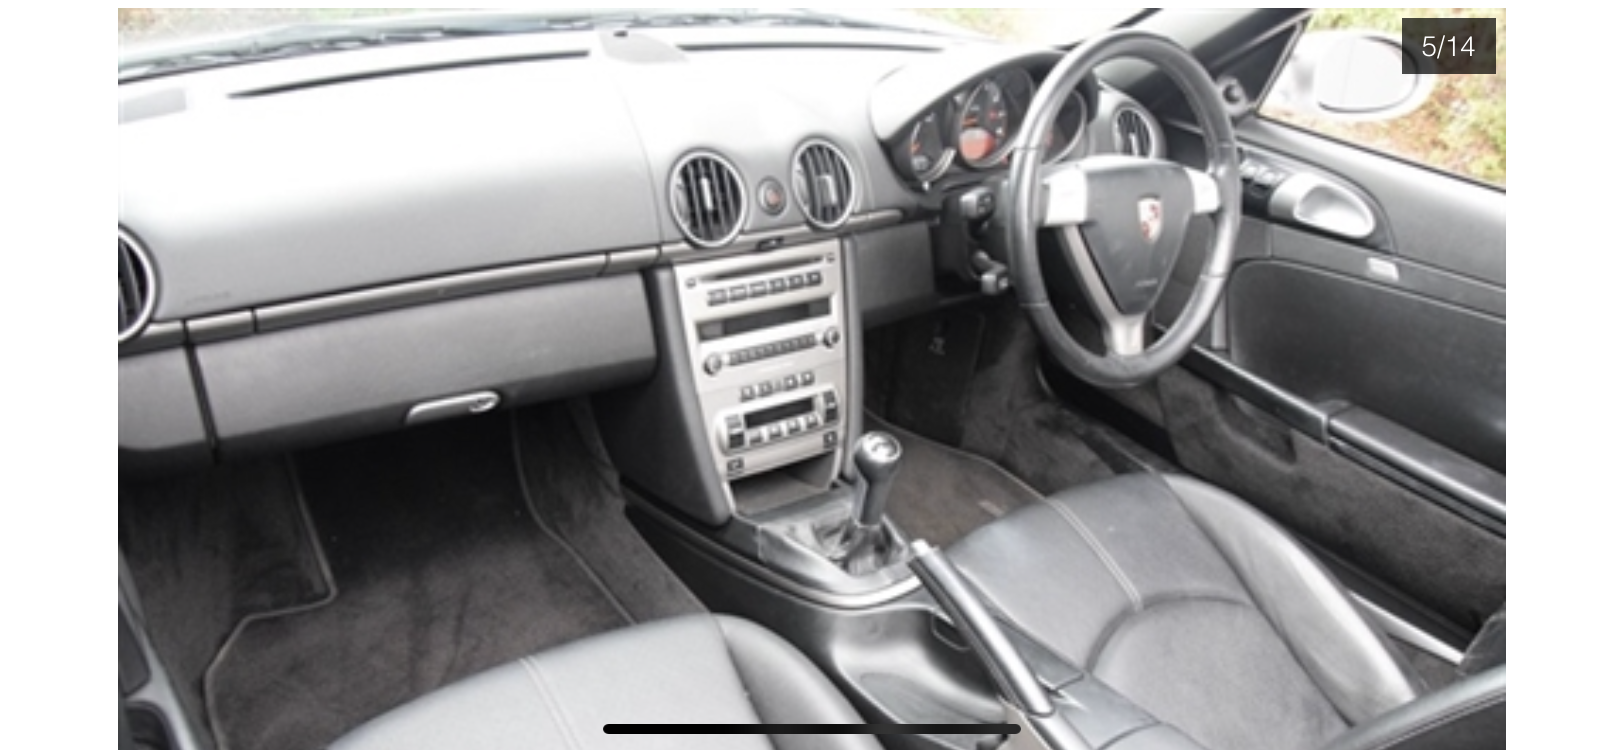 1999 Porsche Boxster 987 For Sale (picture 4 of 6)